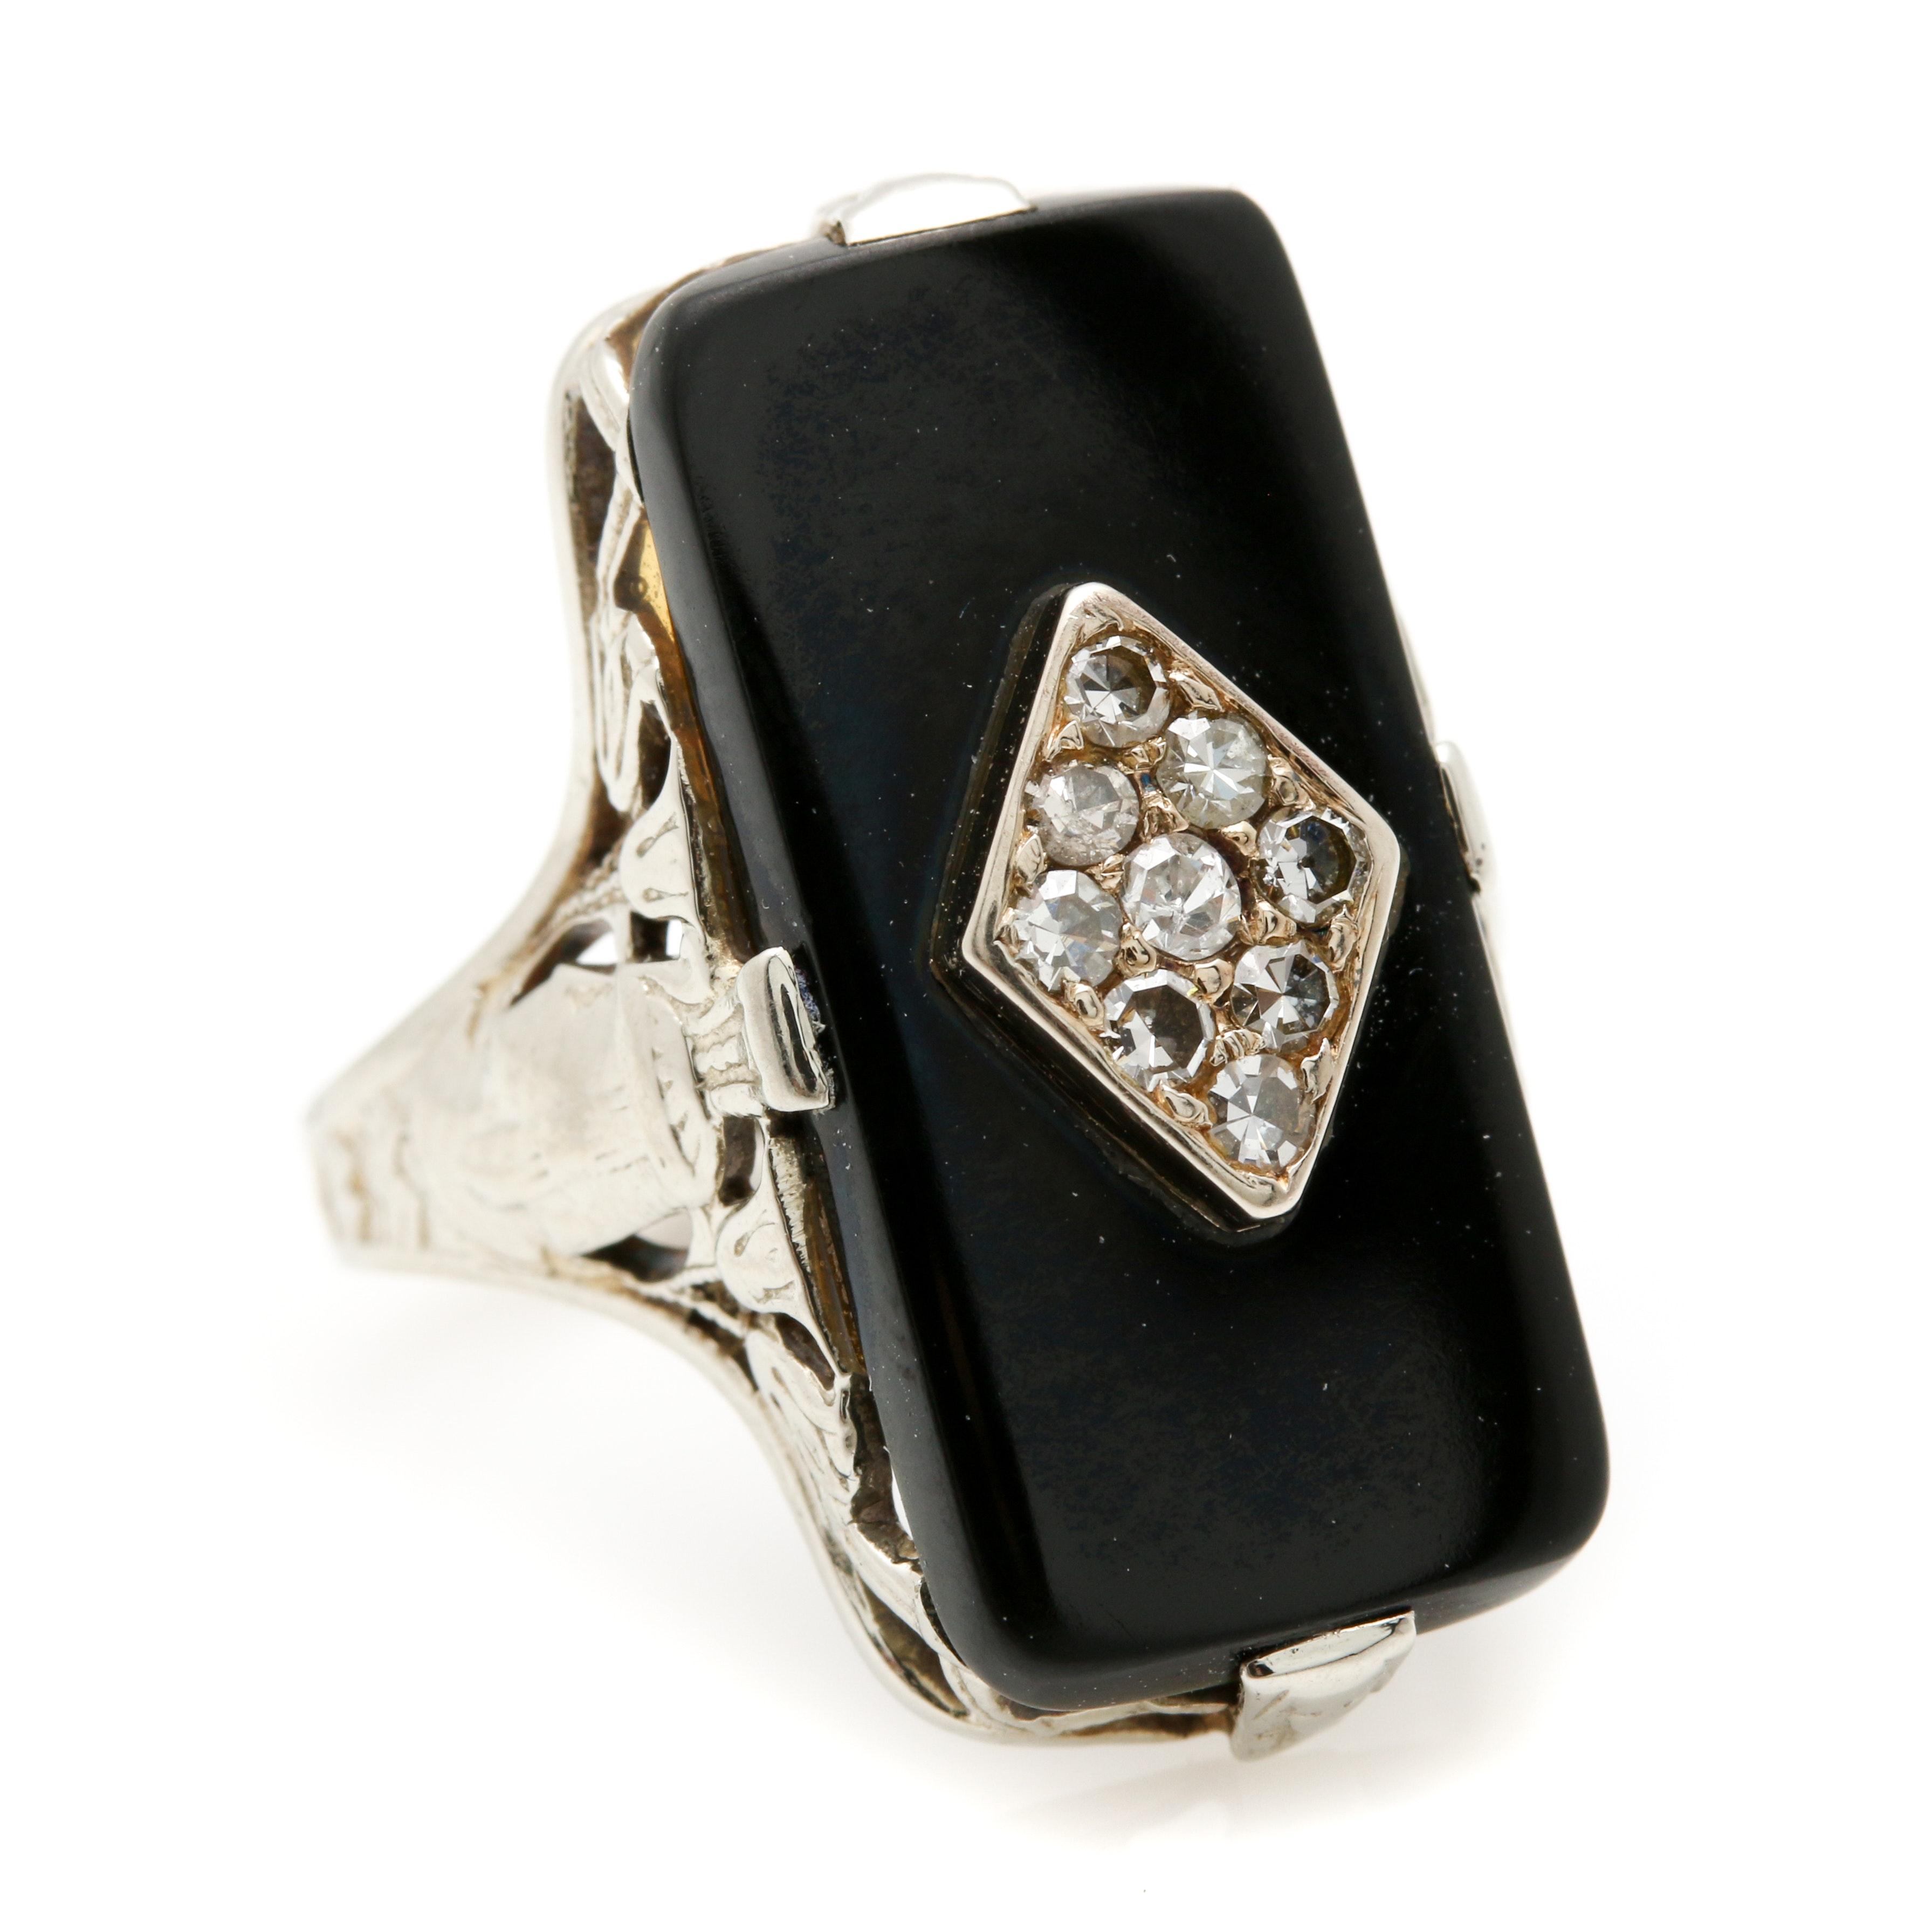 Late Edwardian 14K White Gold Black Onyx and Diamond Ring